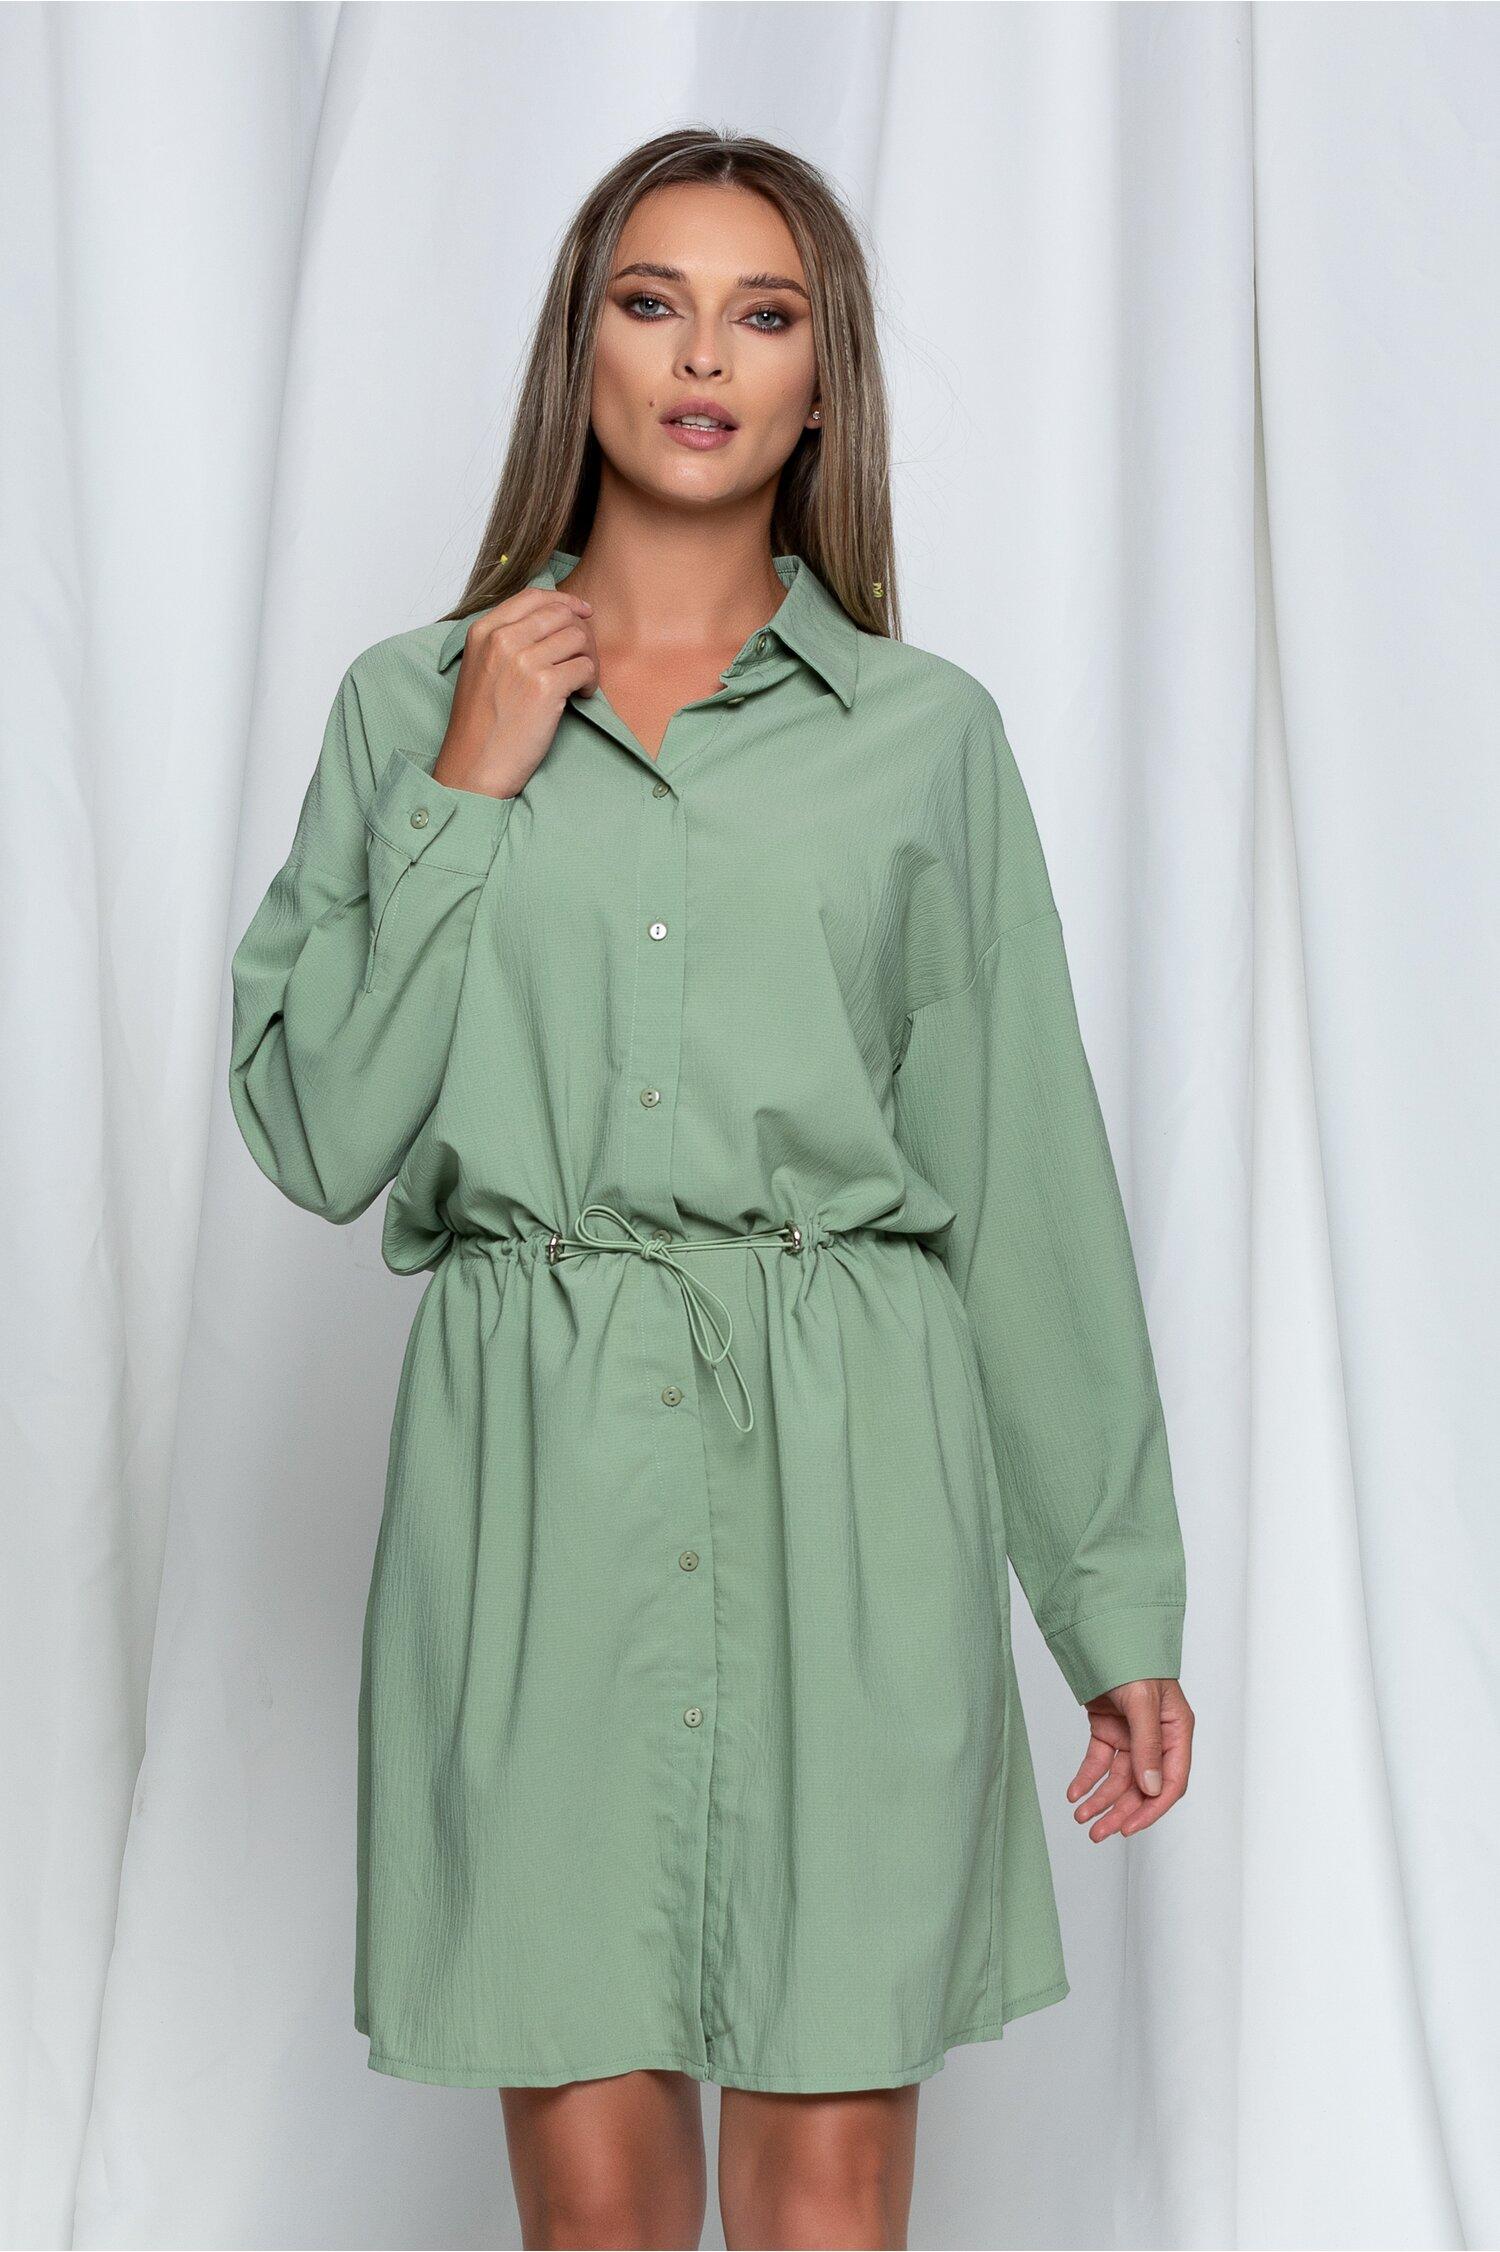 Rochie Betsy tip camasa verde cu snur in talie